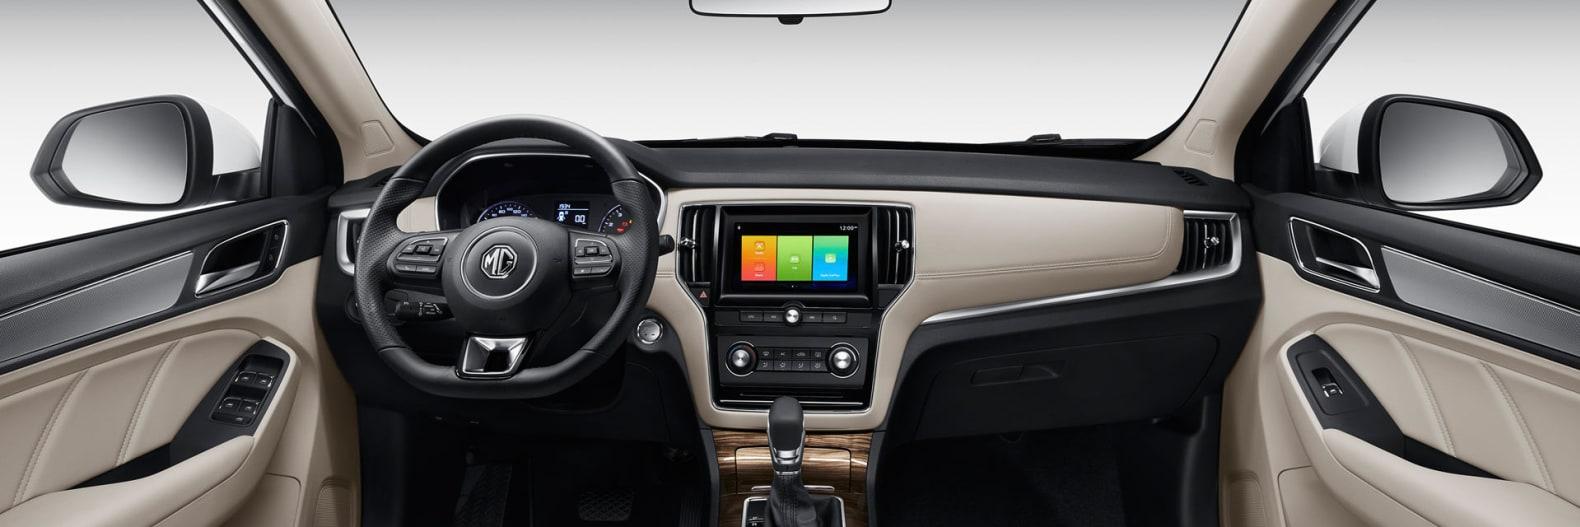 MG RX5 Dashboard